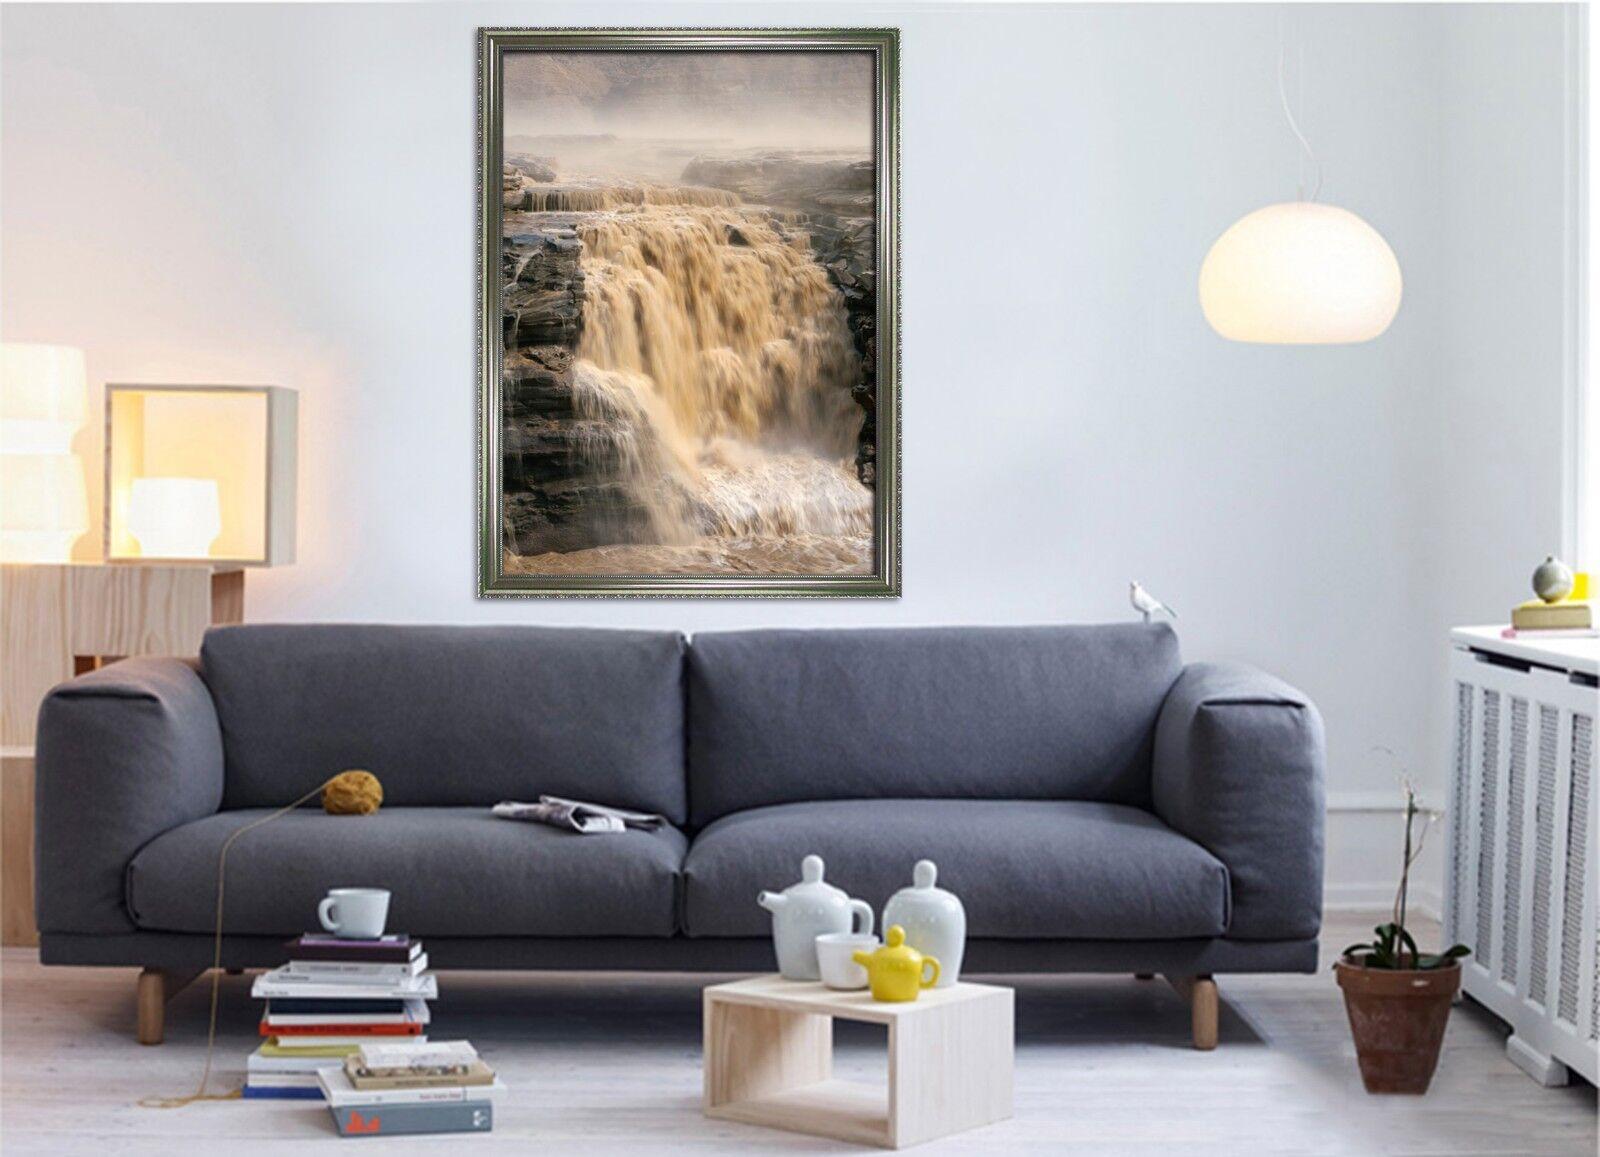 Agua de río Amarillo 3D 2 Póster Enmarcado Decoración del Hogar Pintura de Impresión Arte AJ Wallpaper